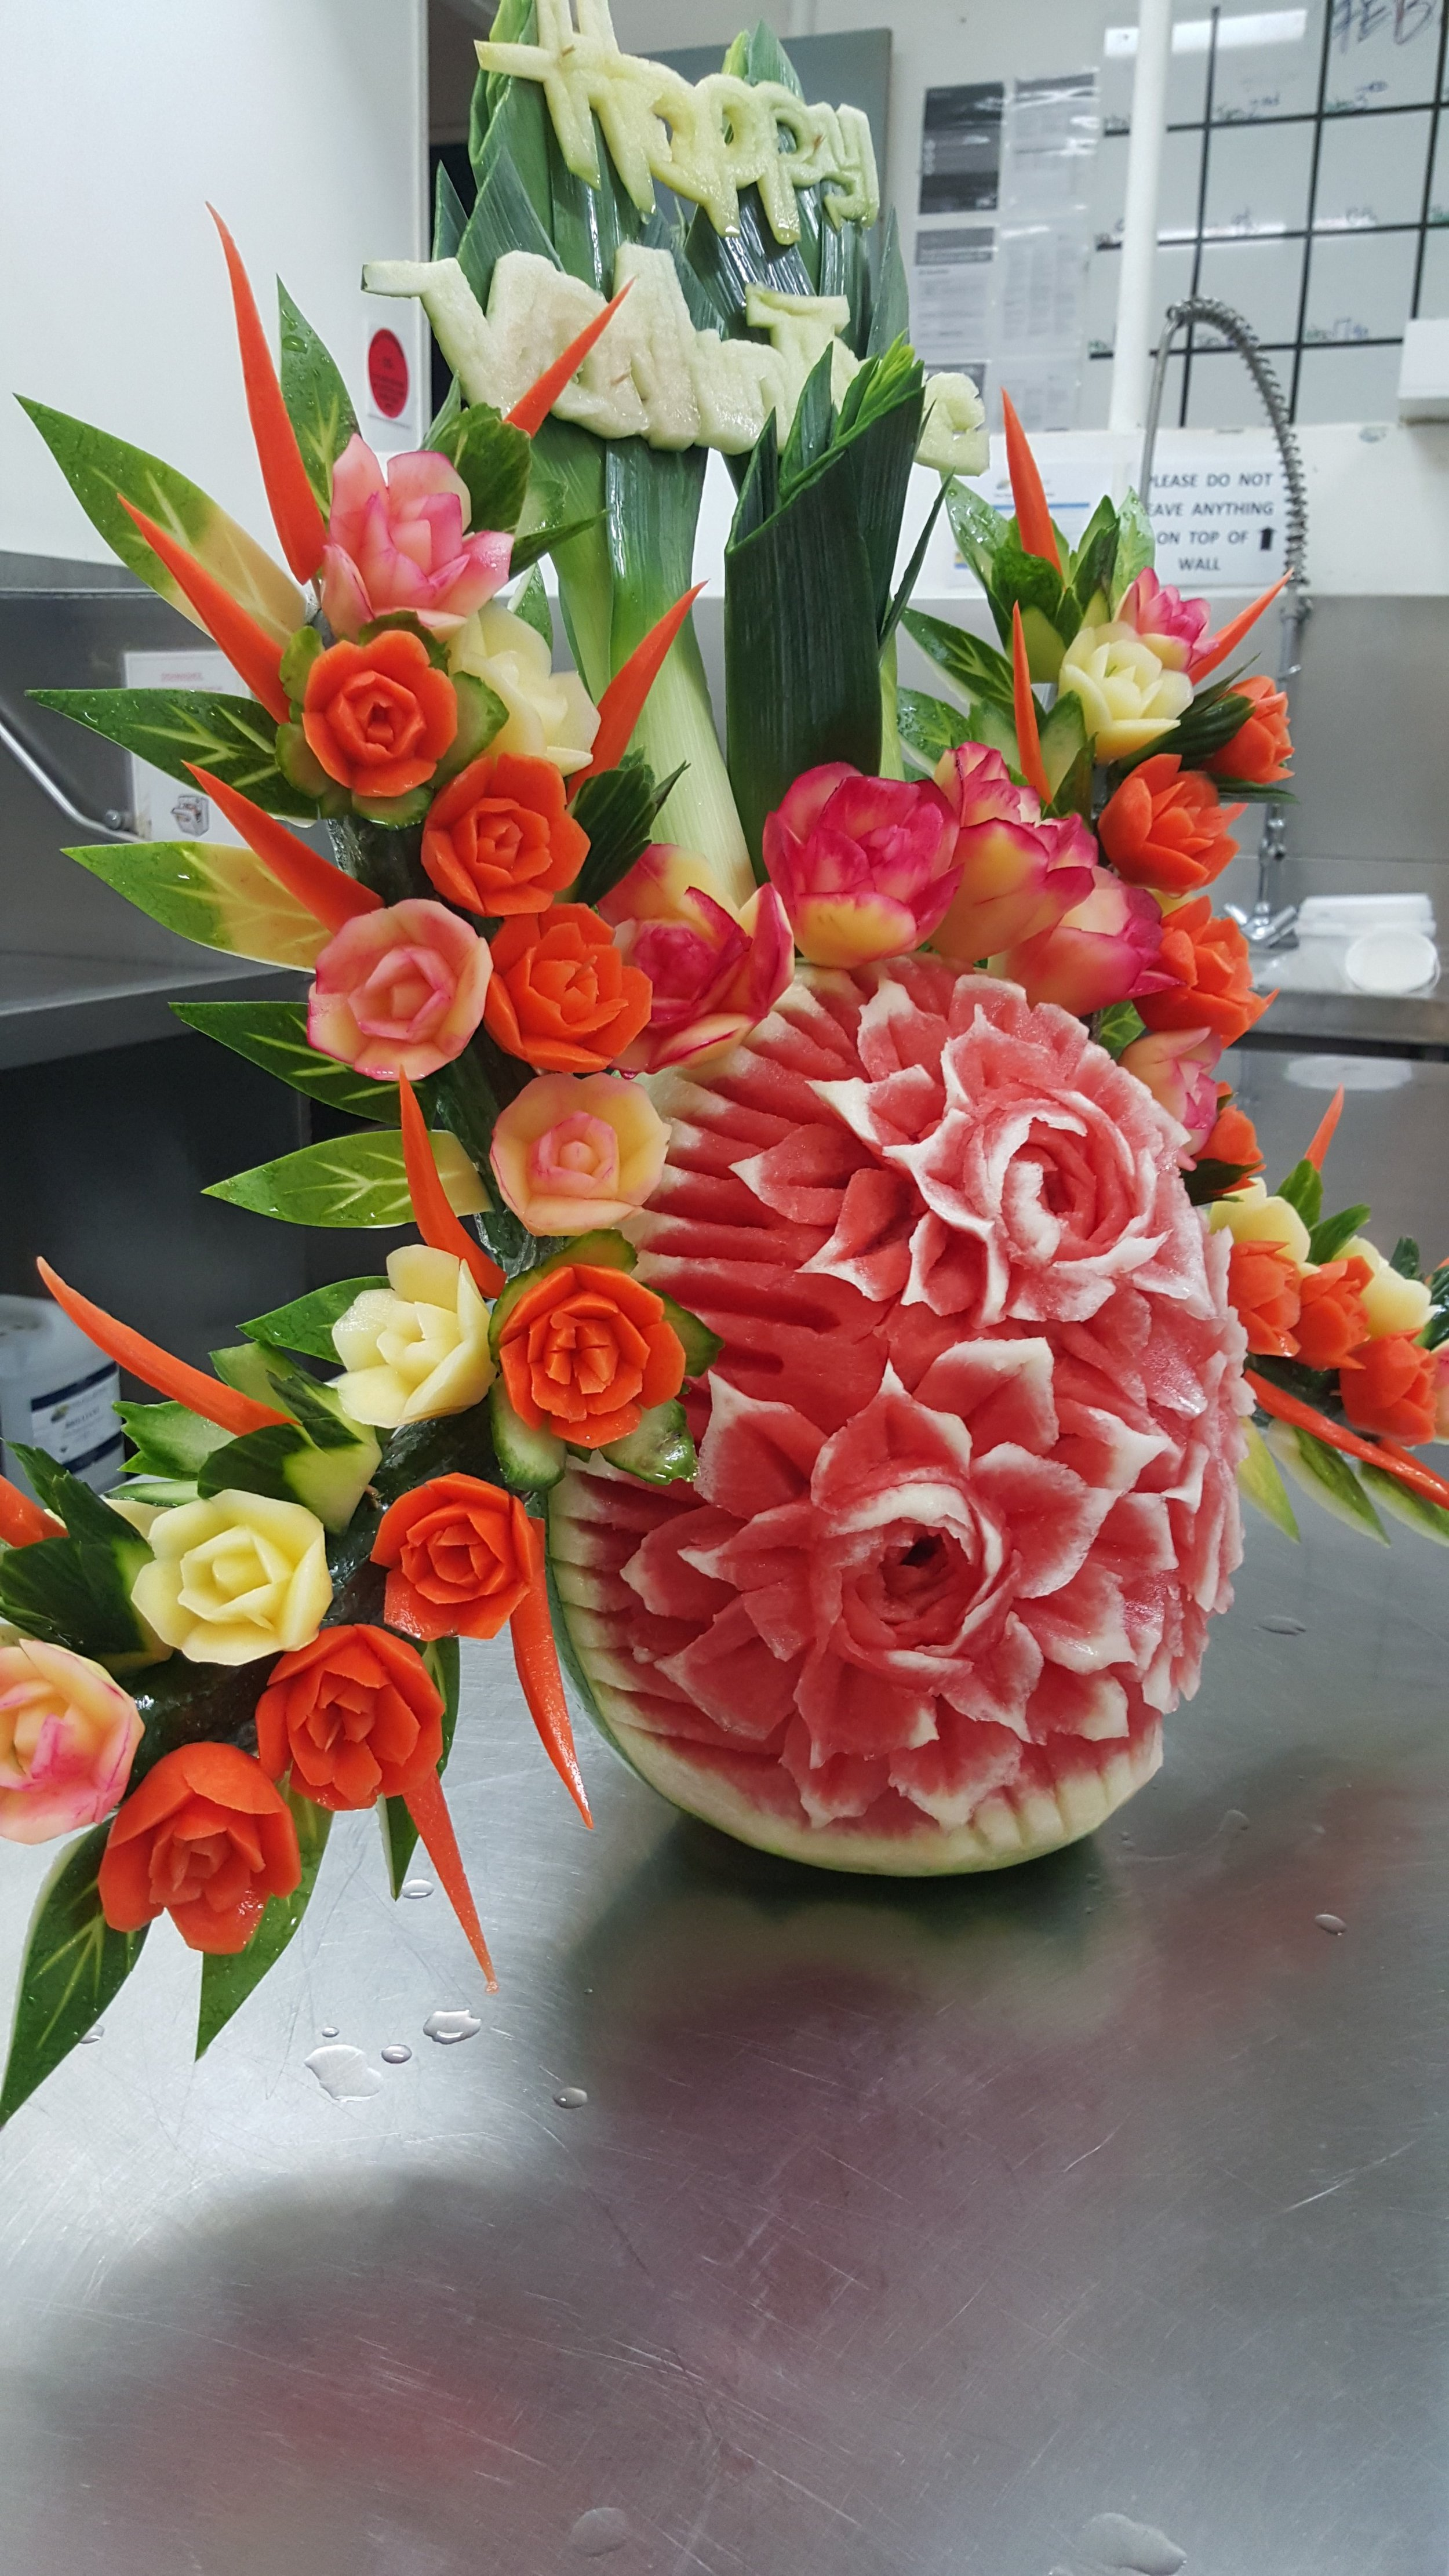 watermelon_carving.jpg